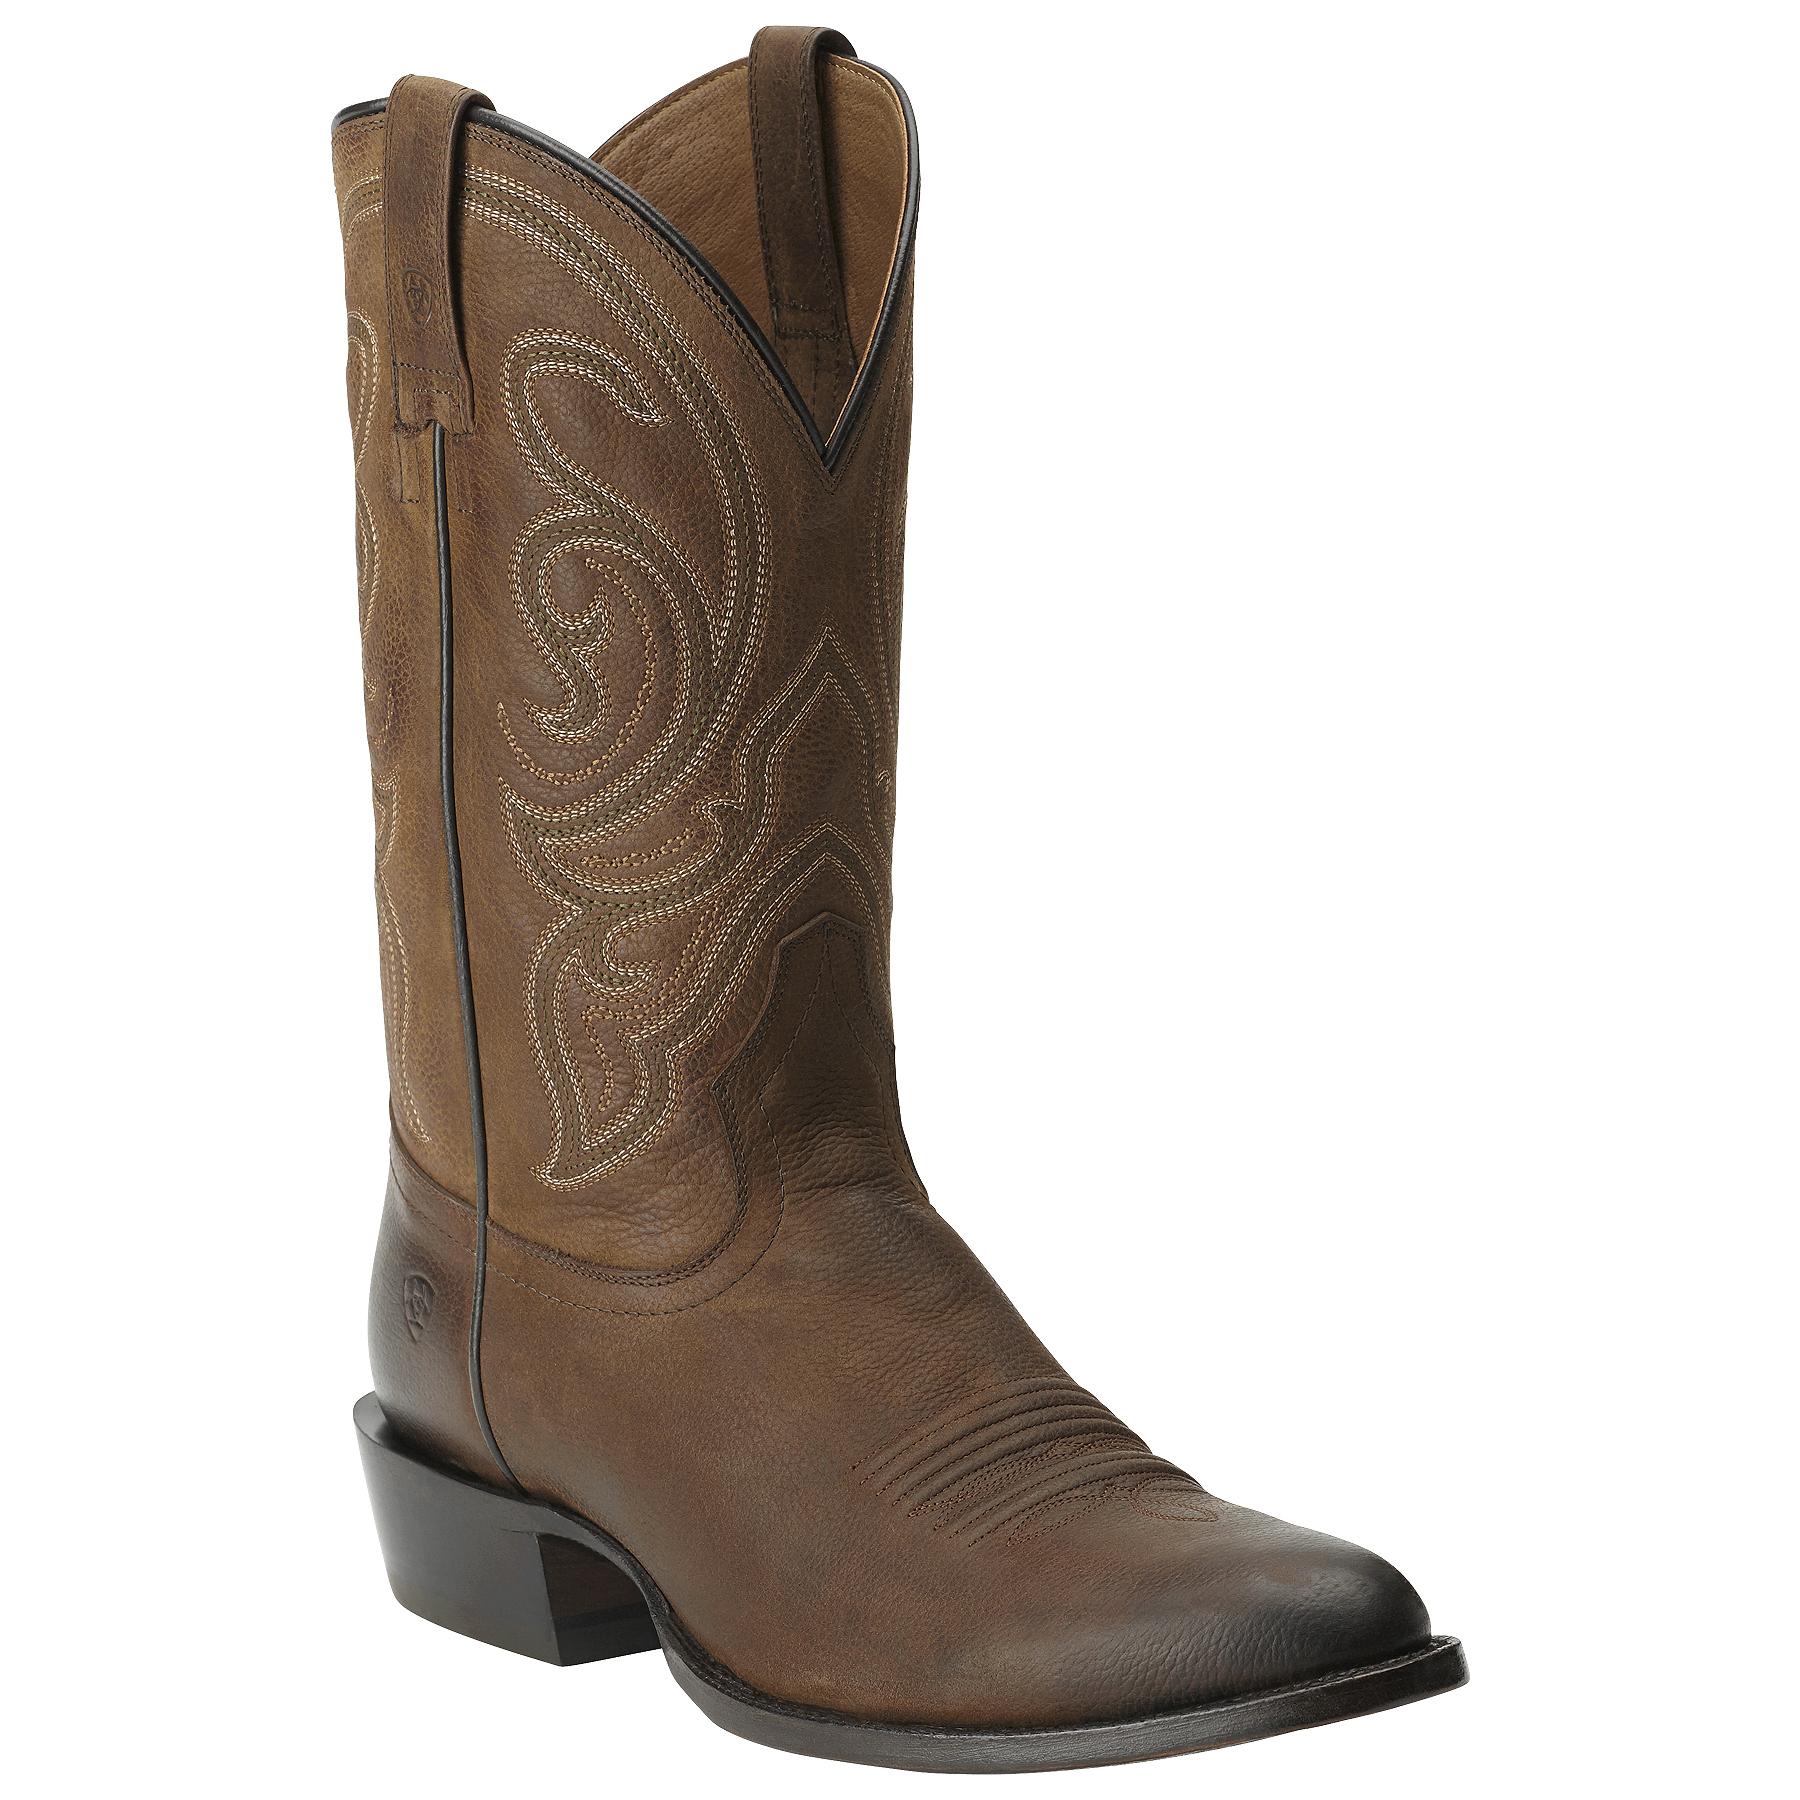 Ariat Men's Bandera Western Boot